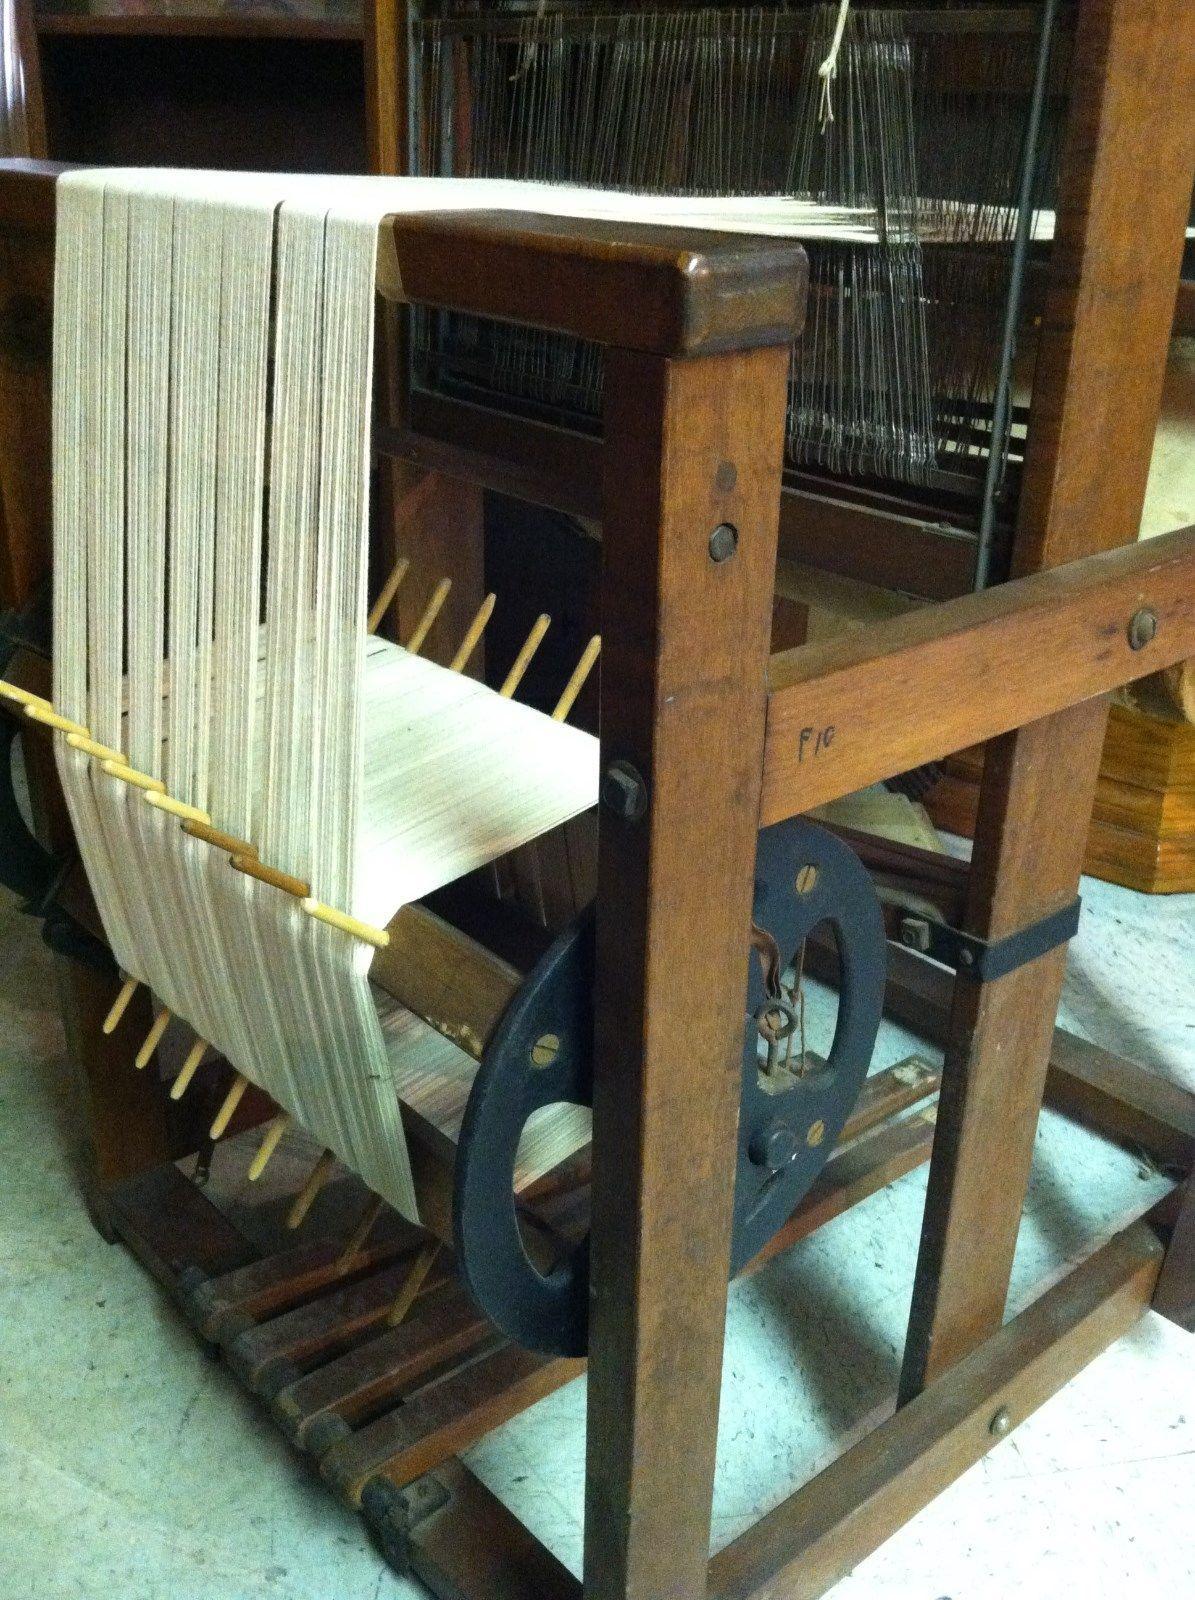 Antique Weaving Loom J L Hammett Co Cambridge Newark Shuttles Bench Vintage  | eBay